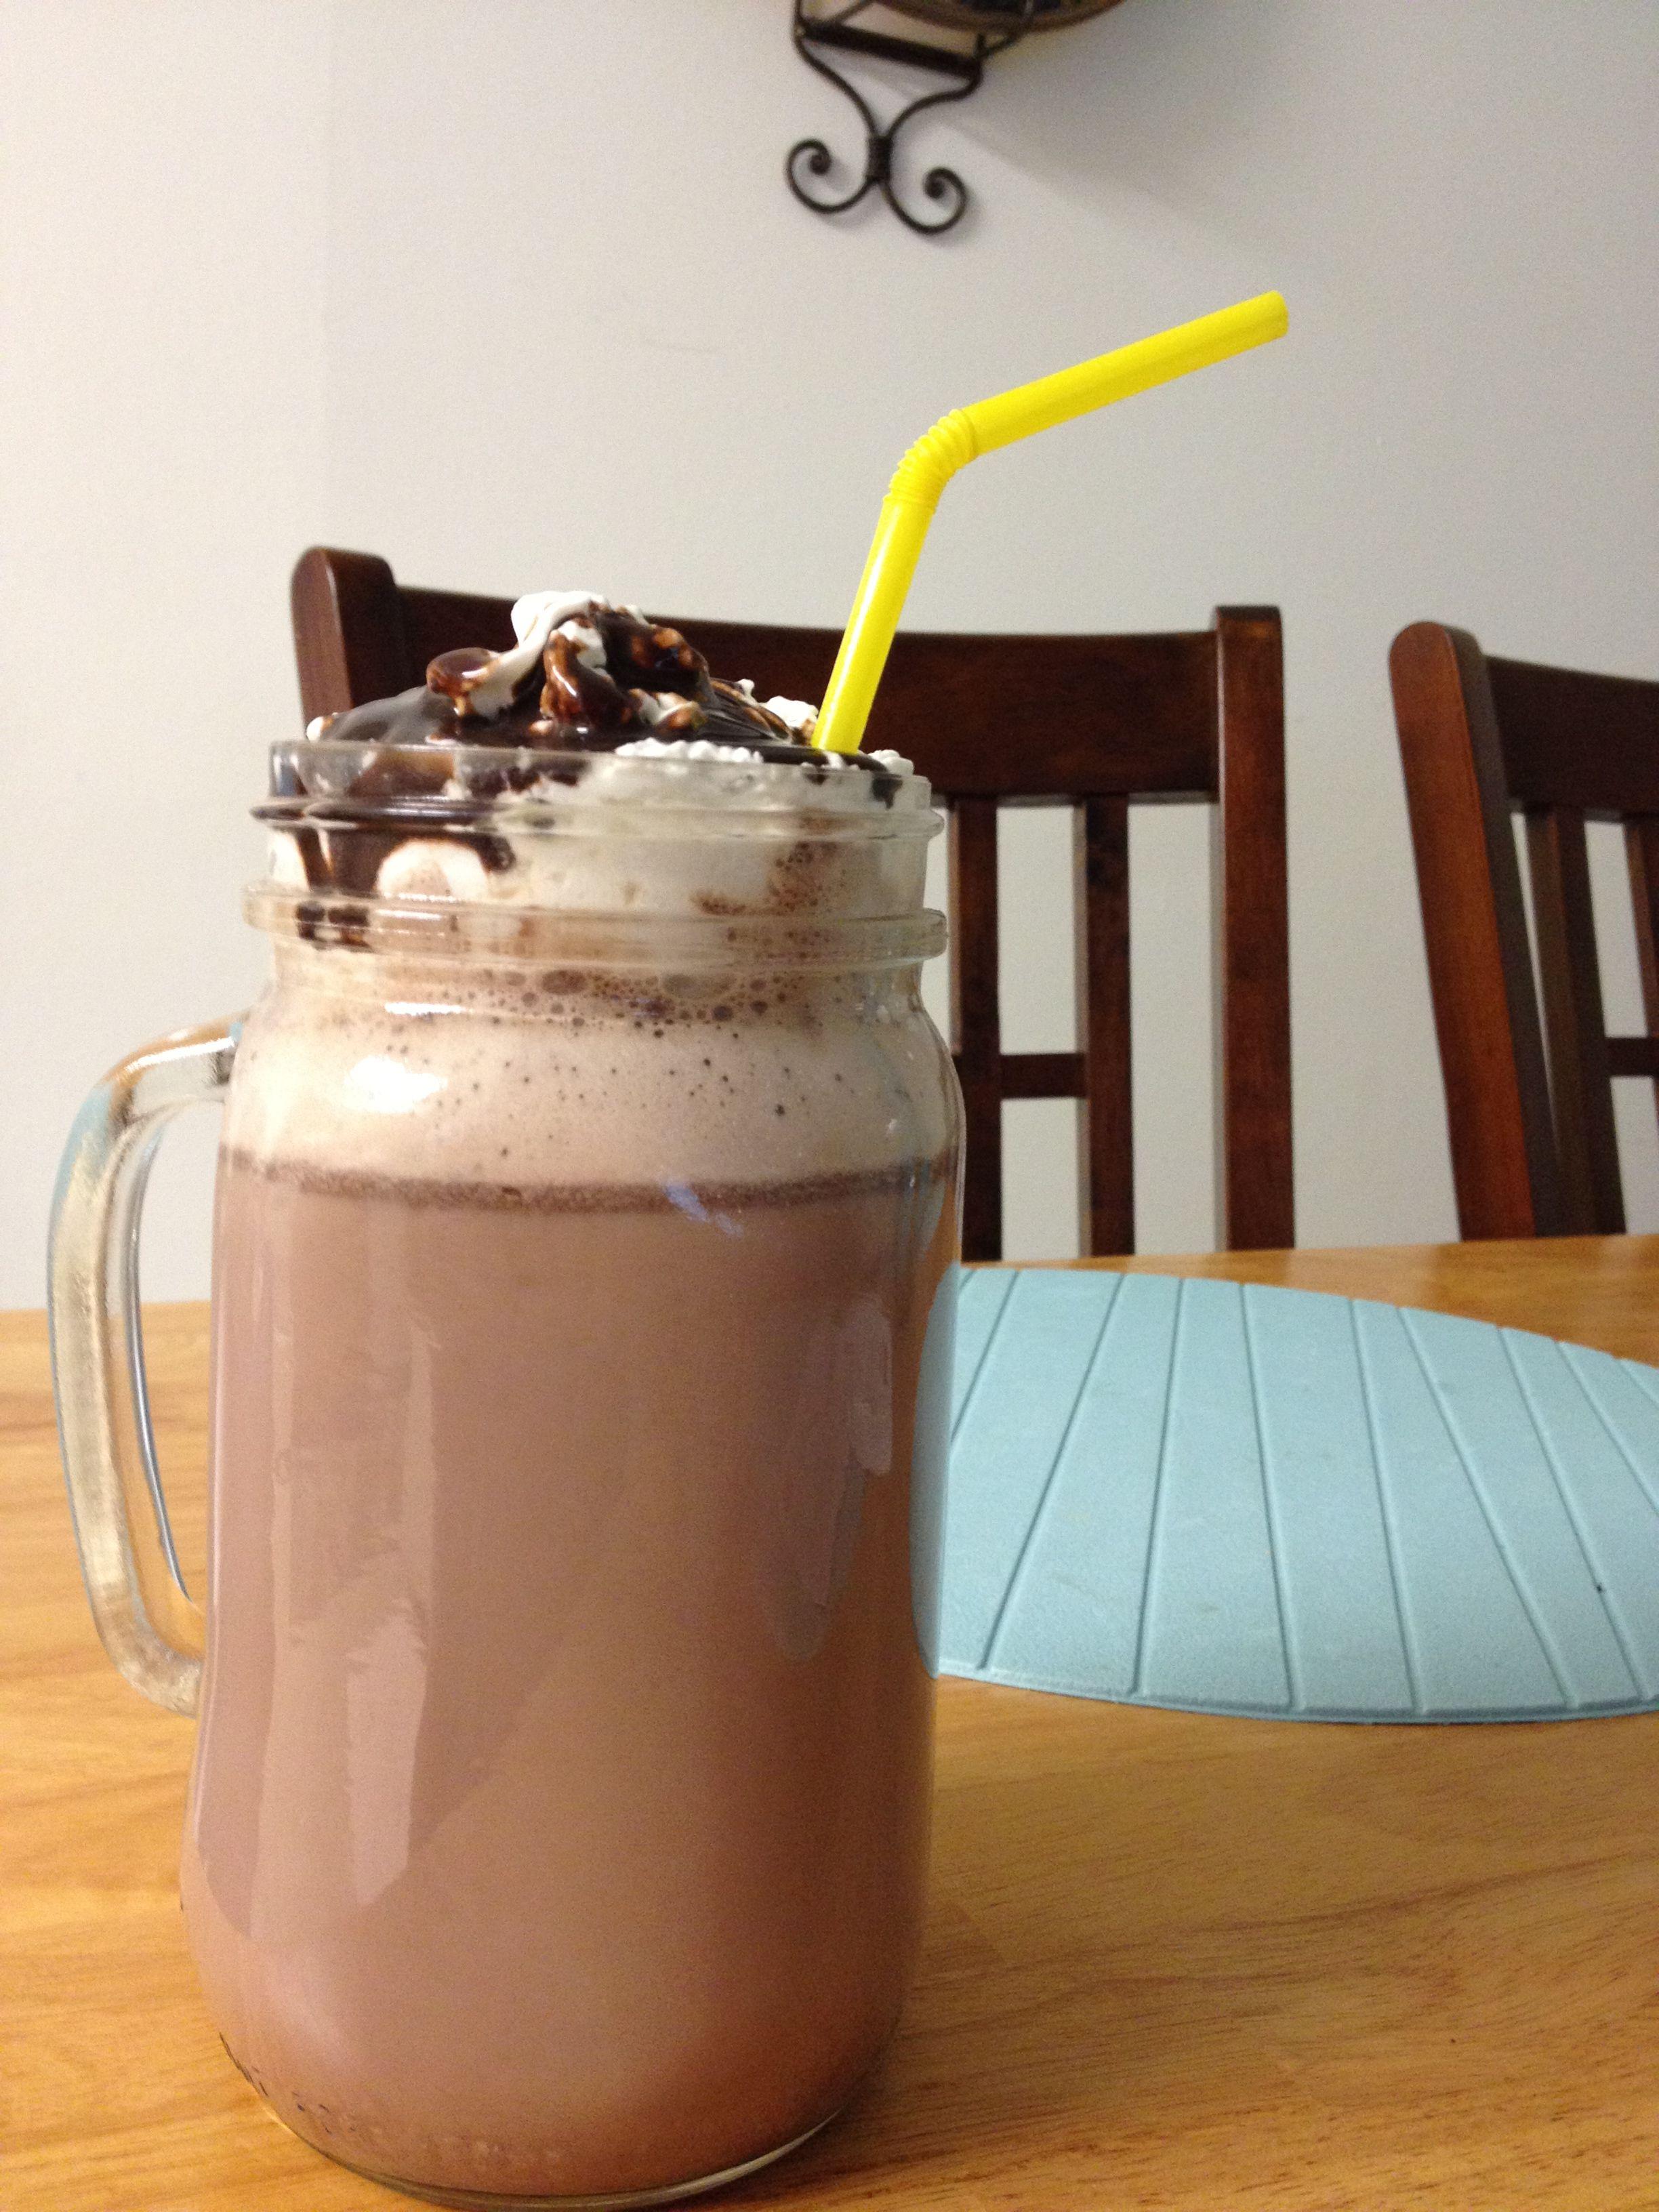 Skinny hot chocolate hot water, diet packet of powdered